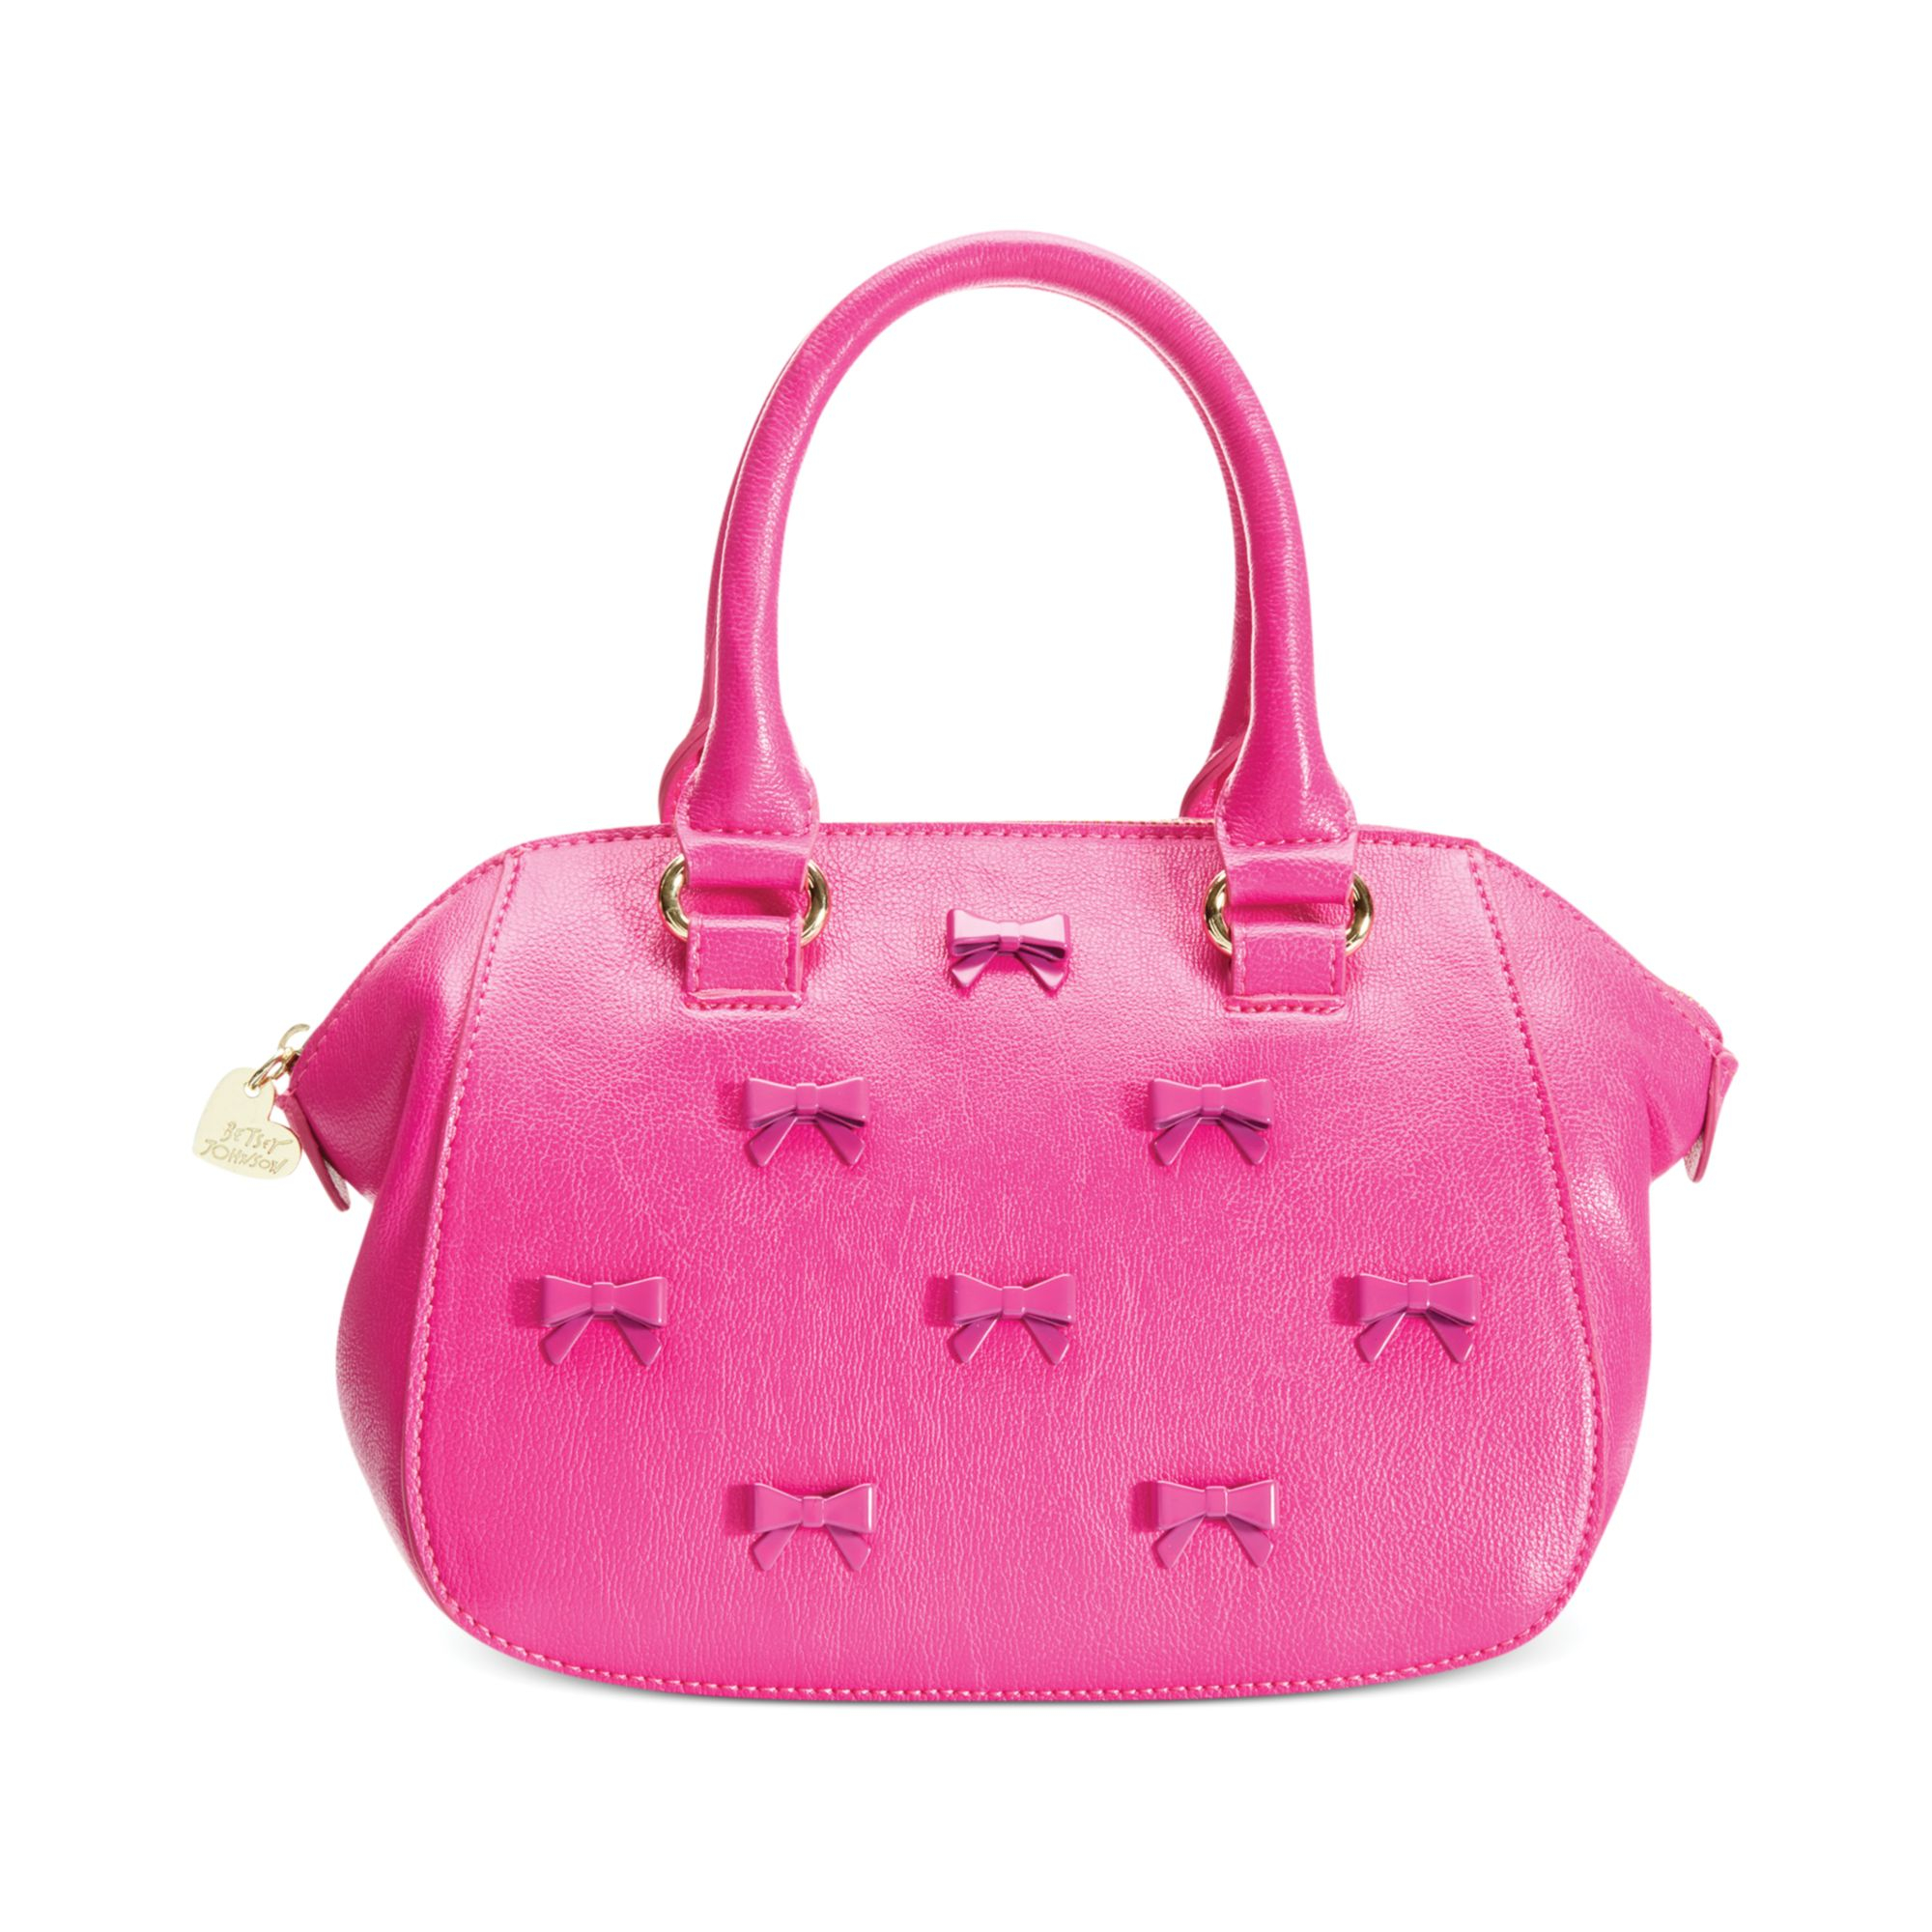 01cecd1fbeda Betsey Johnson Pink Little Bow Chic Crossbody Satchel